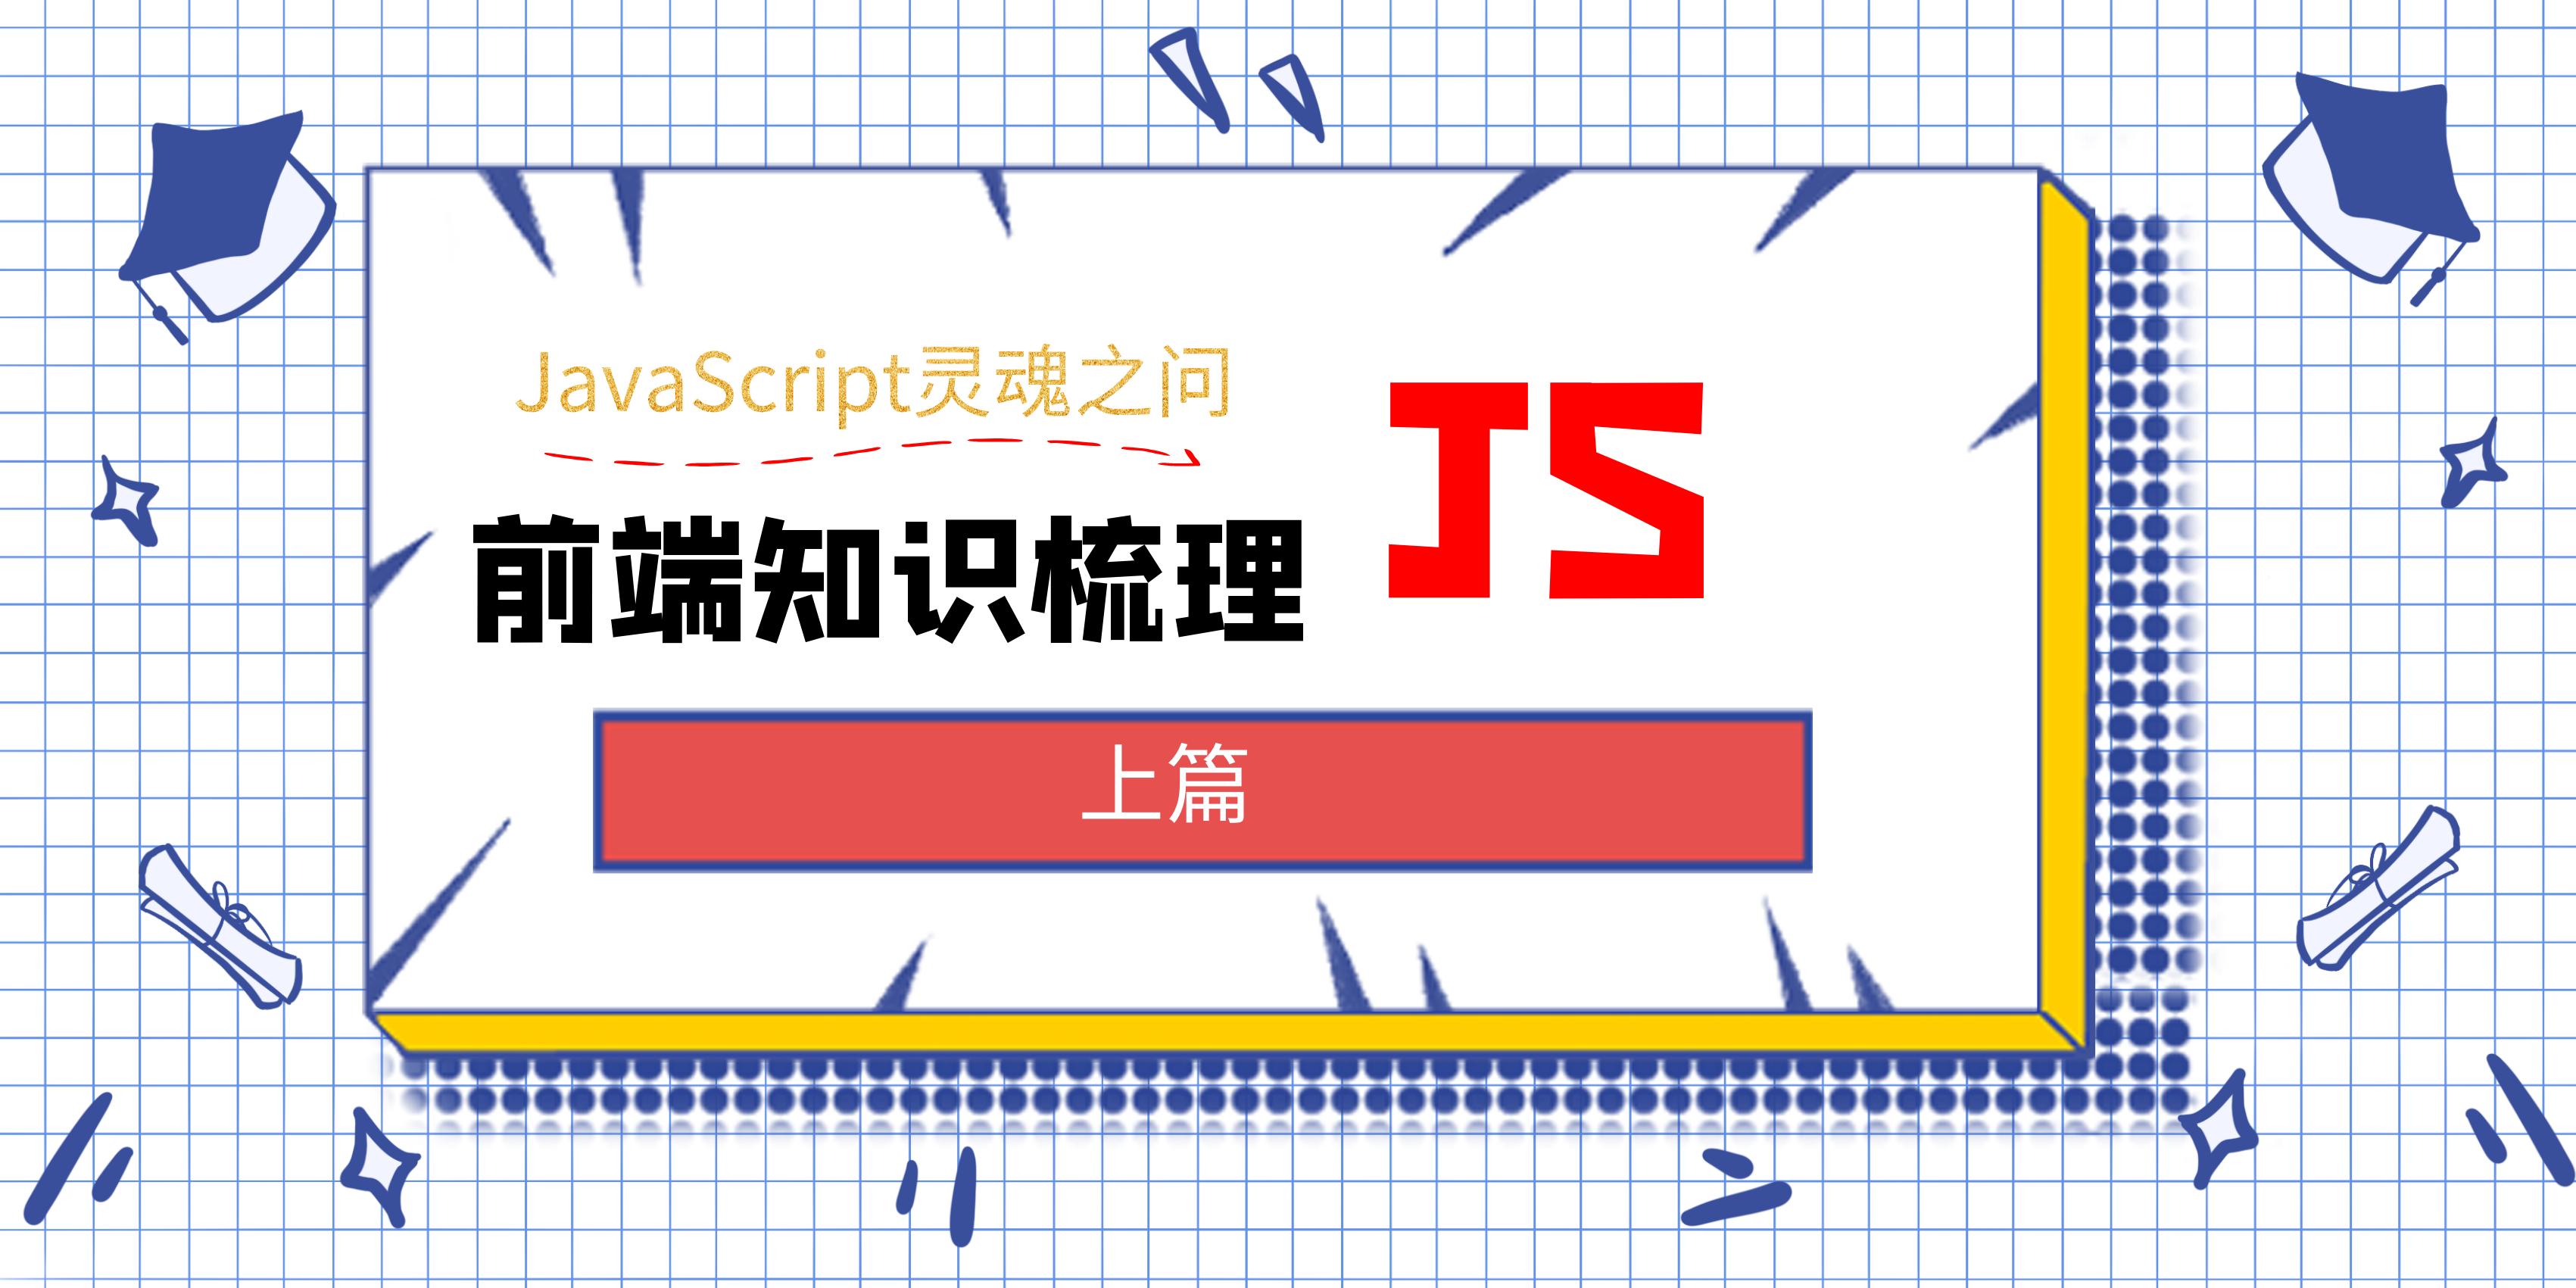 「JavaScript灵魂之问」前端知识梳理之 JS 篇(上篇)